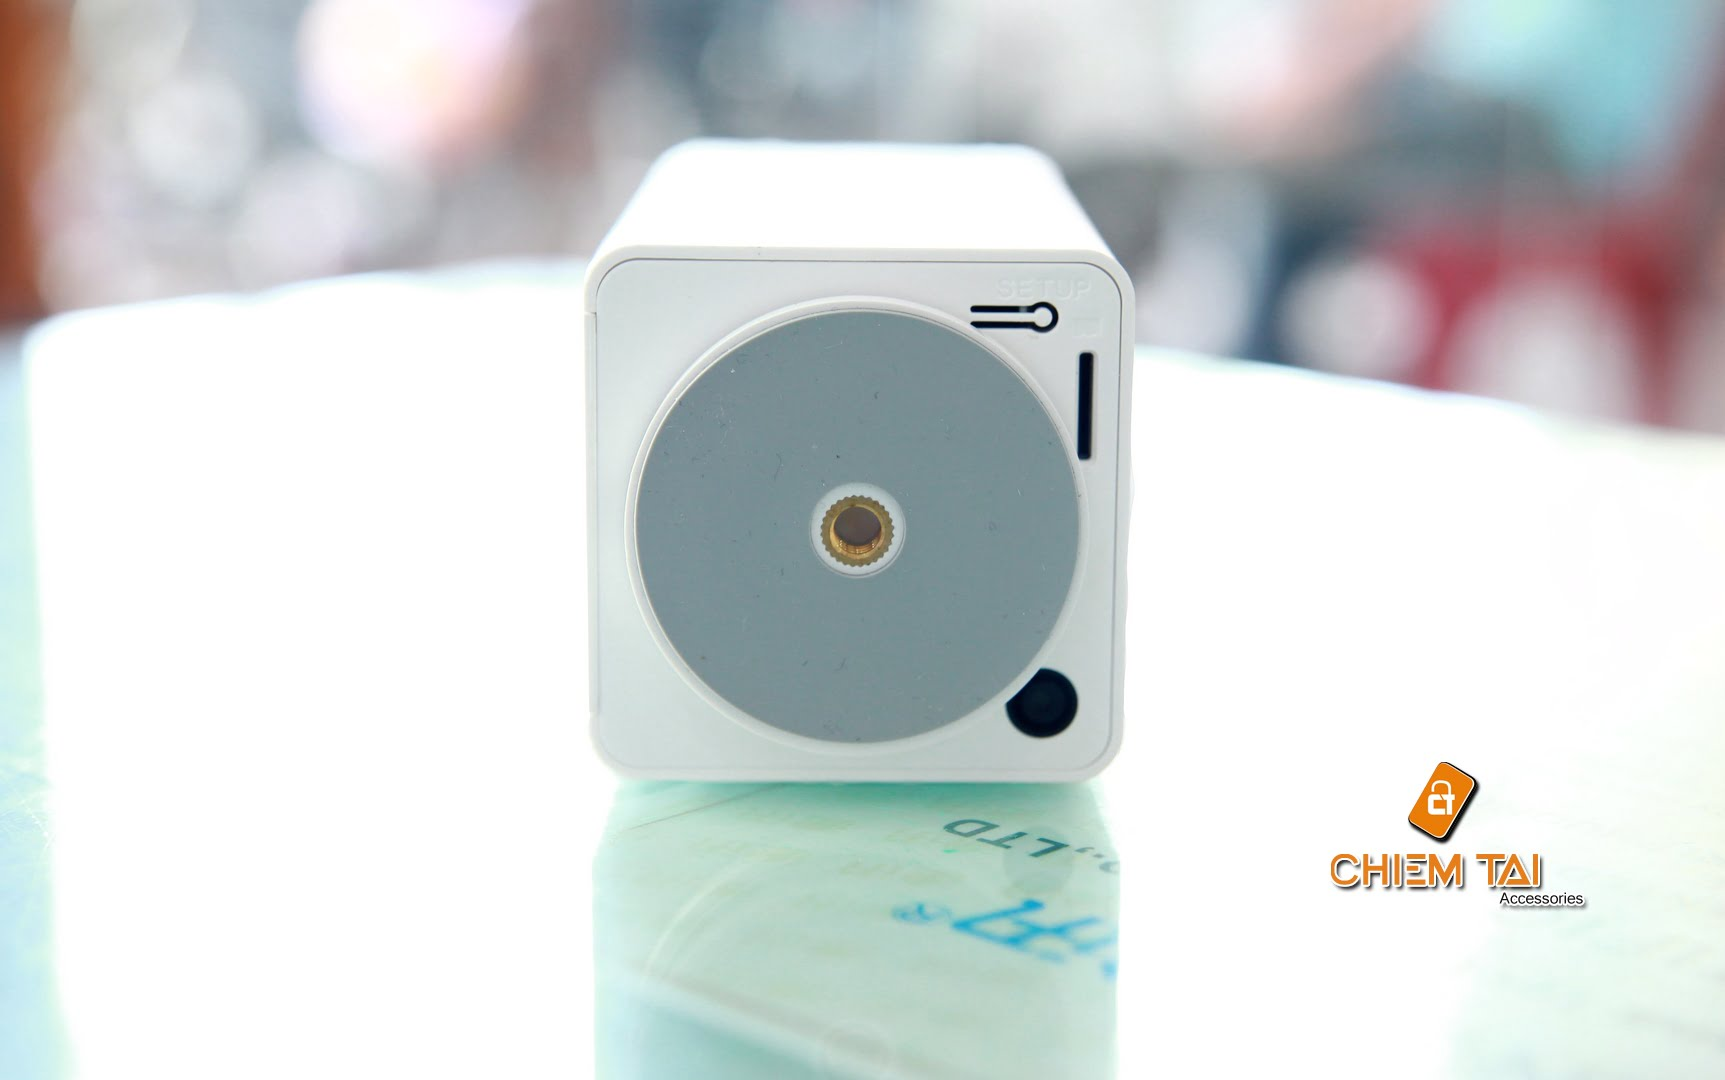 camera ip xiaomi xiaofang square ptz 360 full hd 1080p 6007d4439e69a